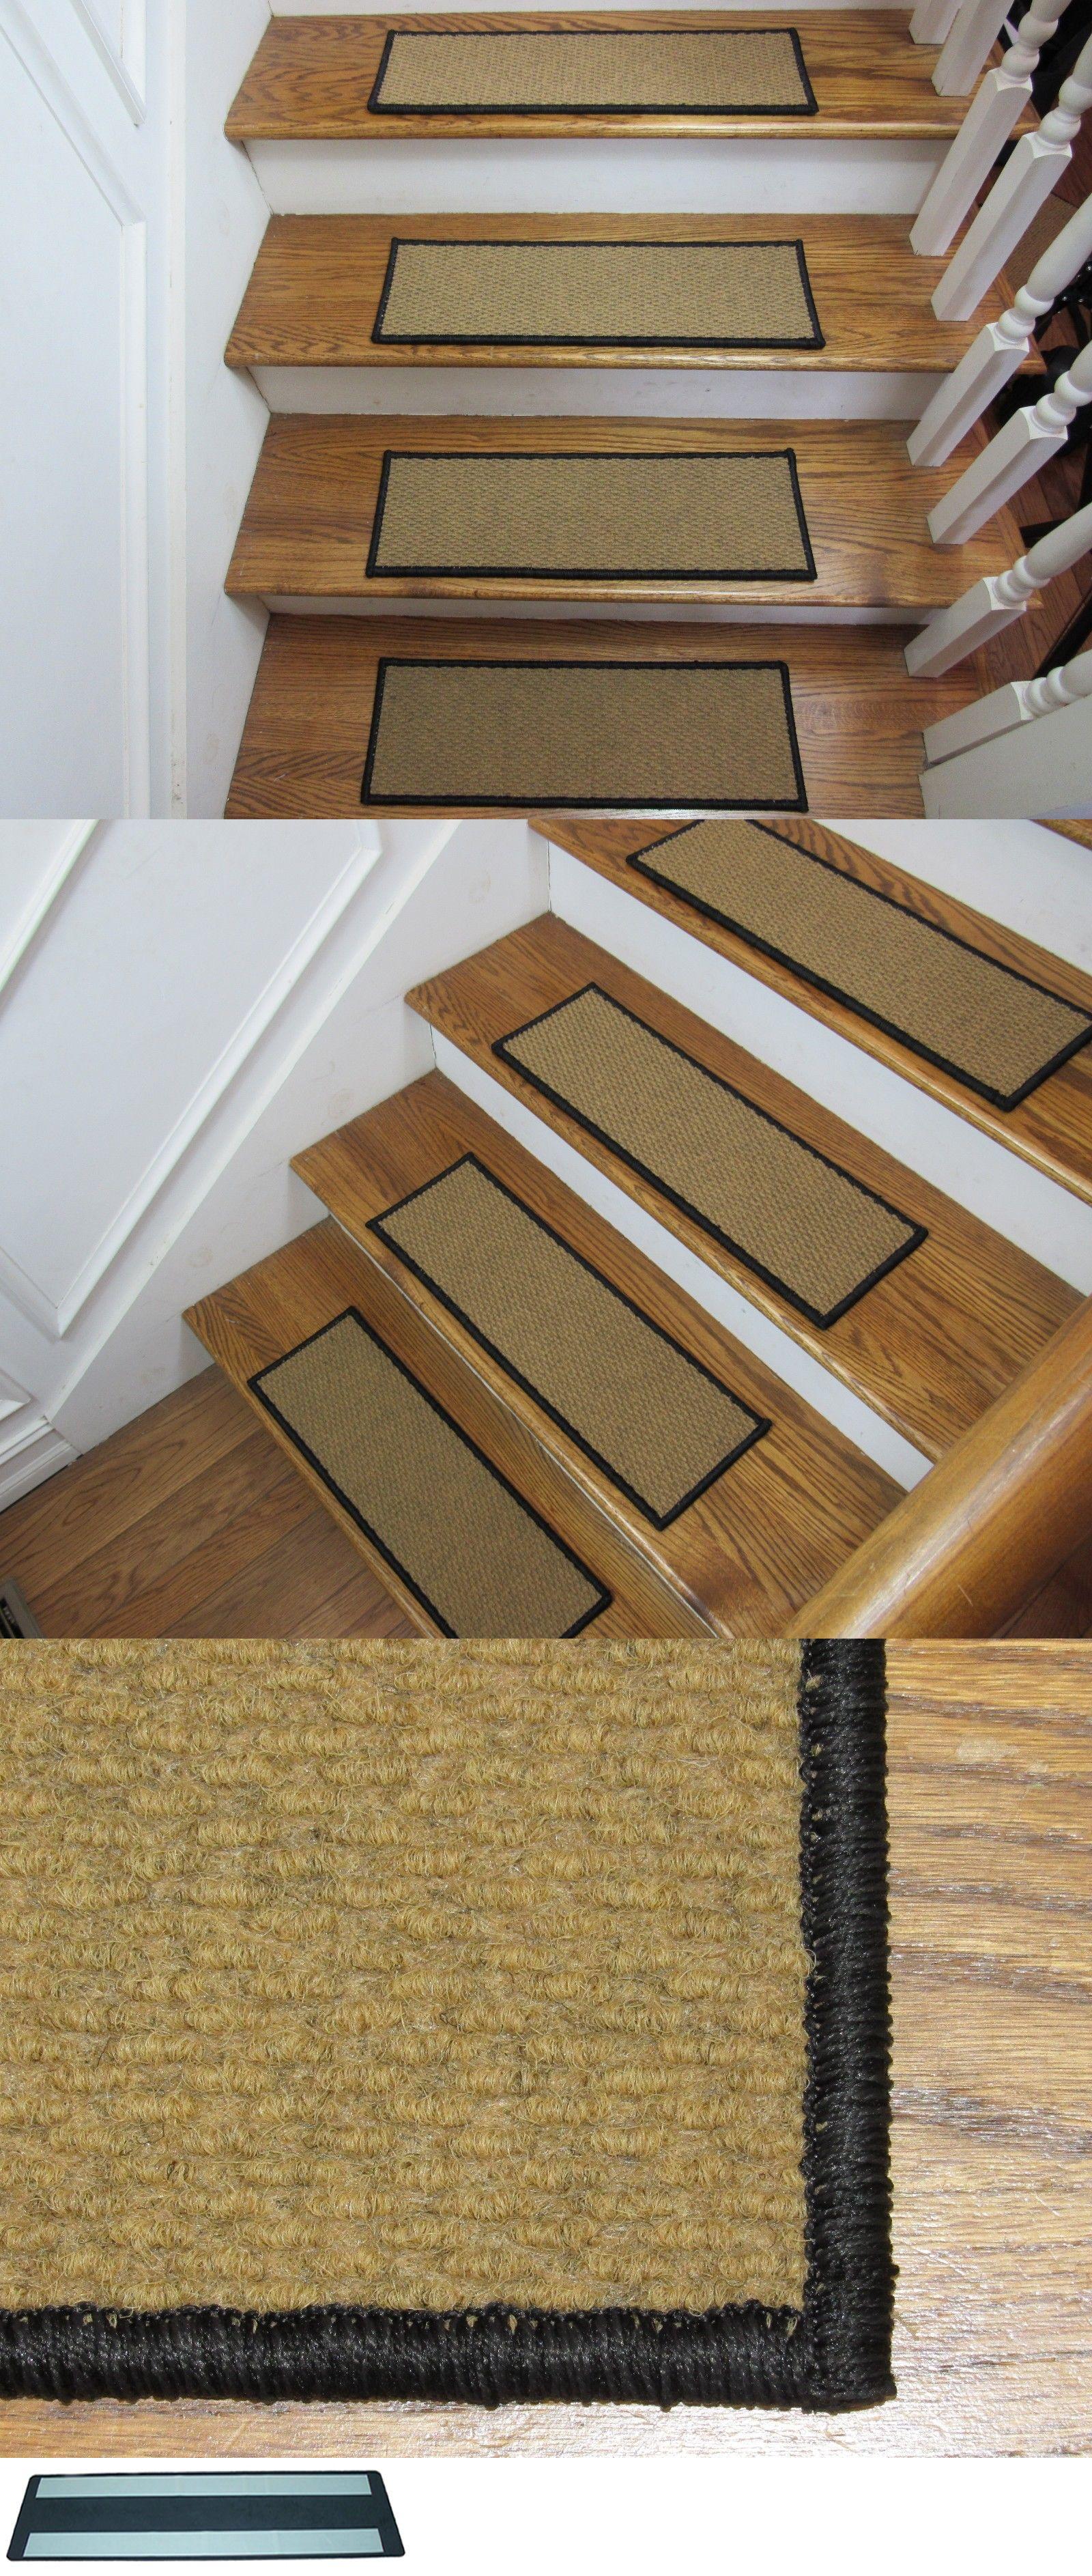 Stair Treads Serged Carpet Stair Treads Style Berber